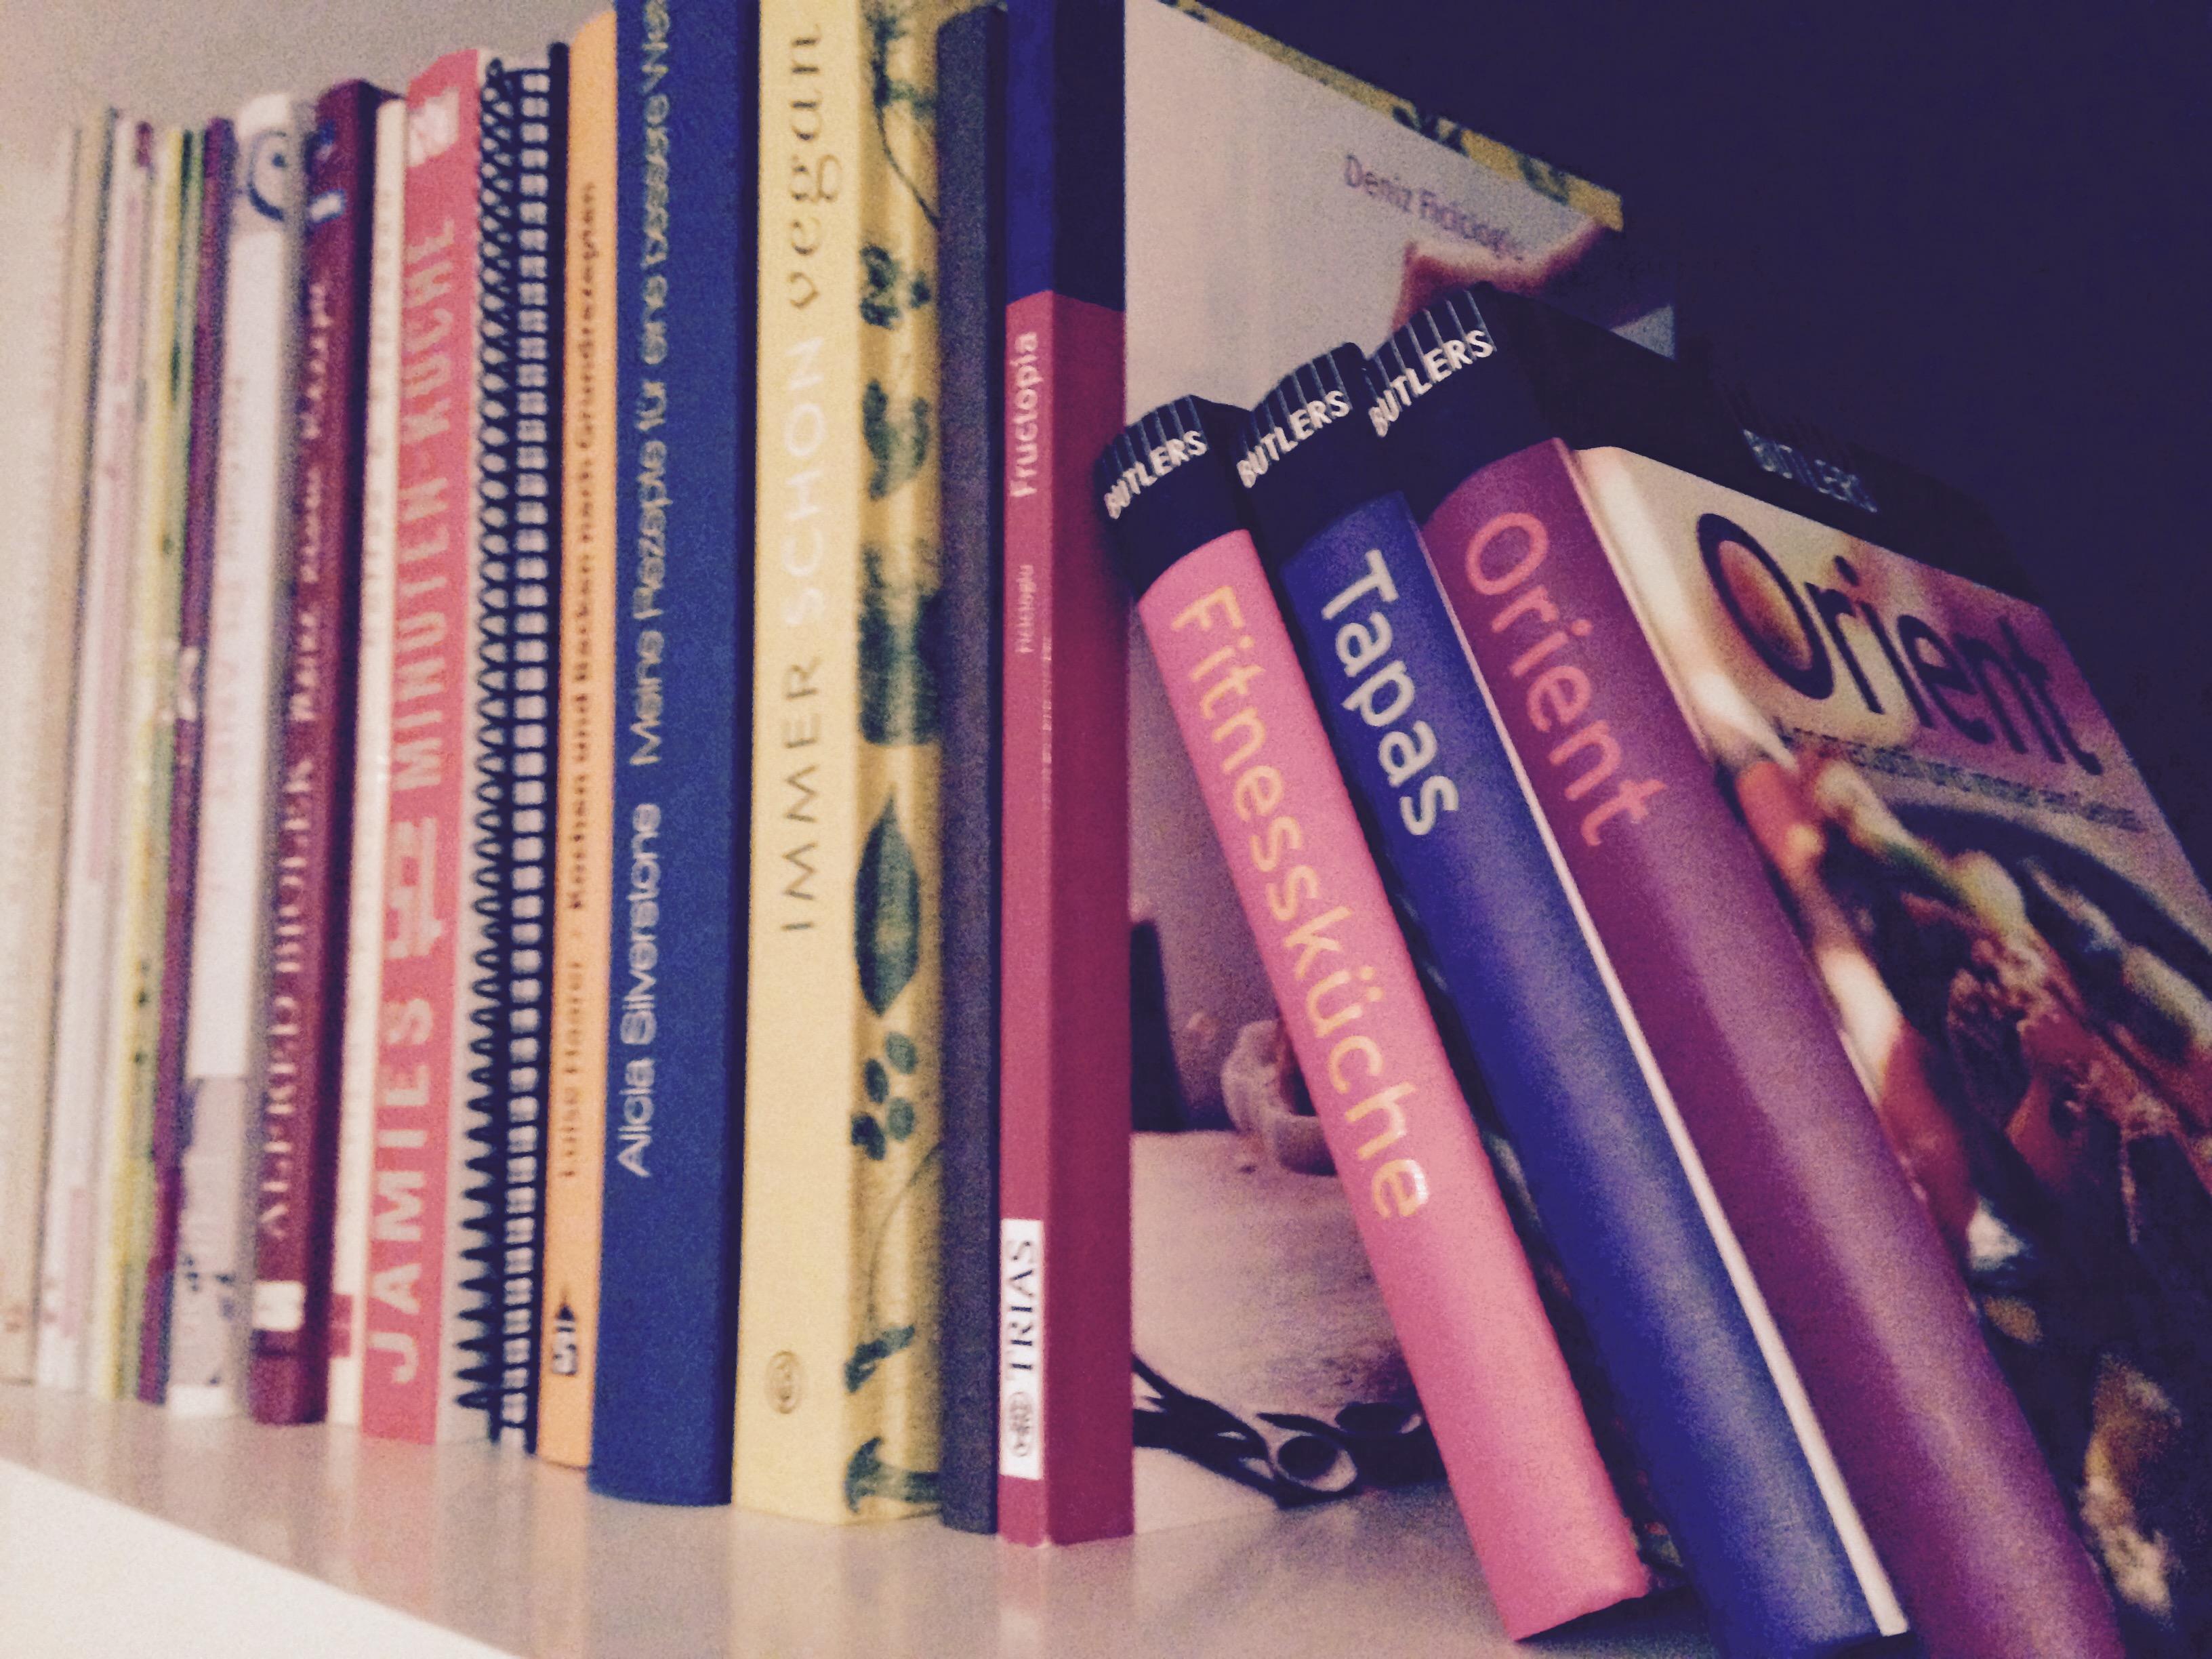 Fall wishlist | cookbook edition